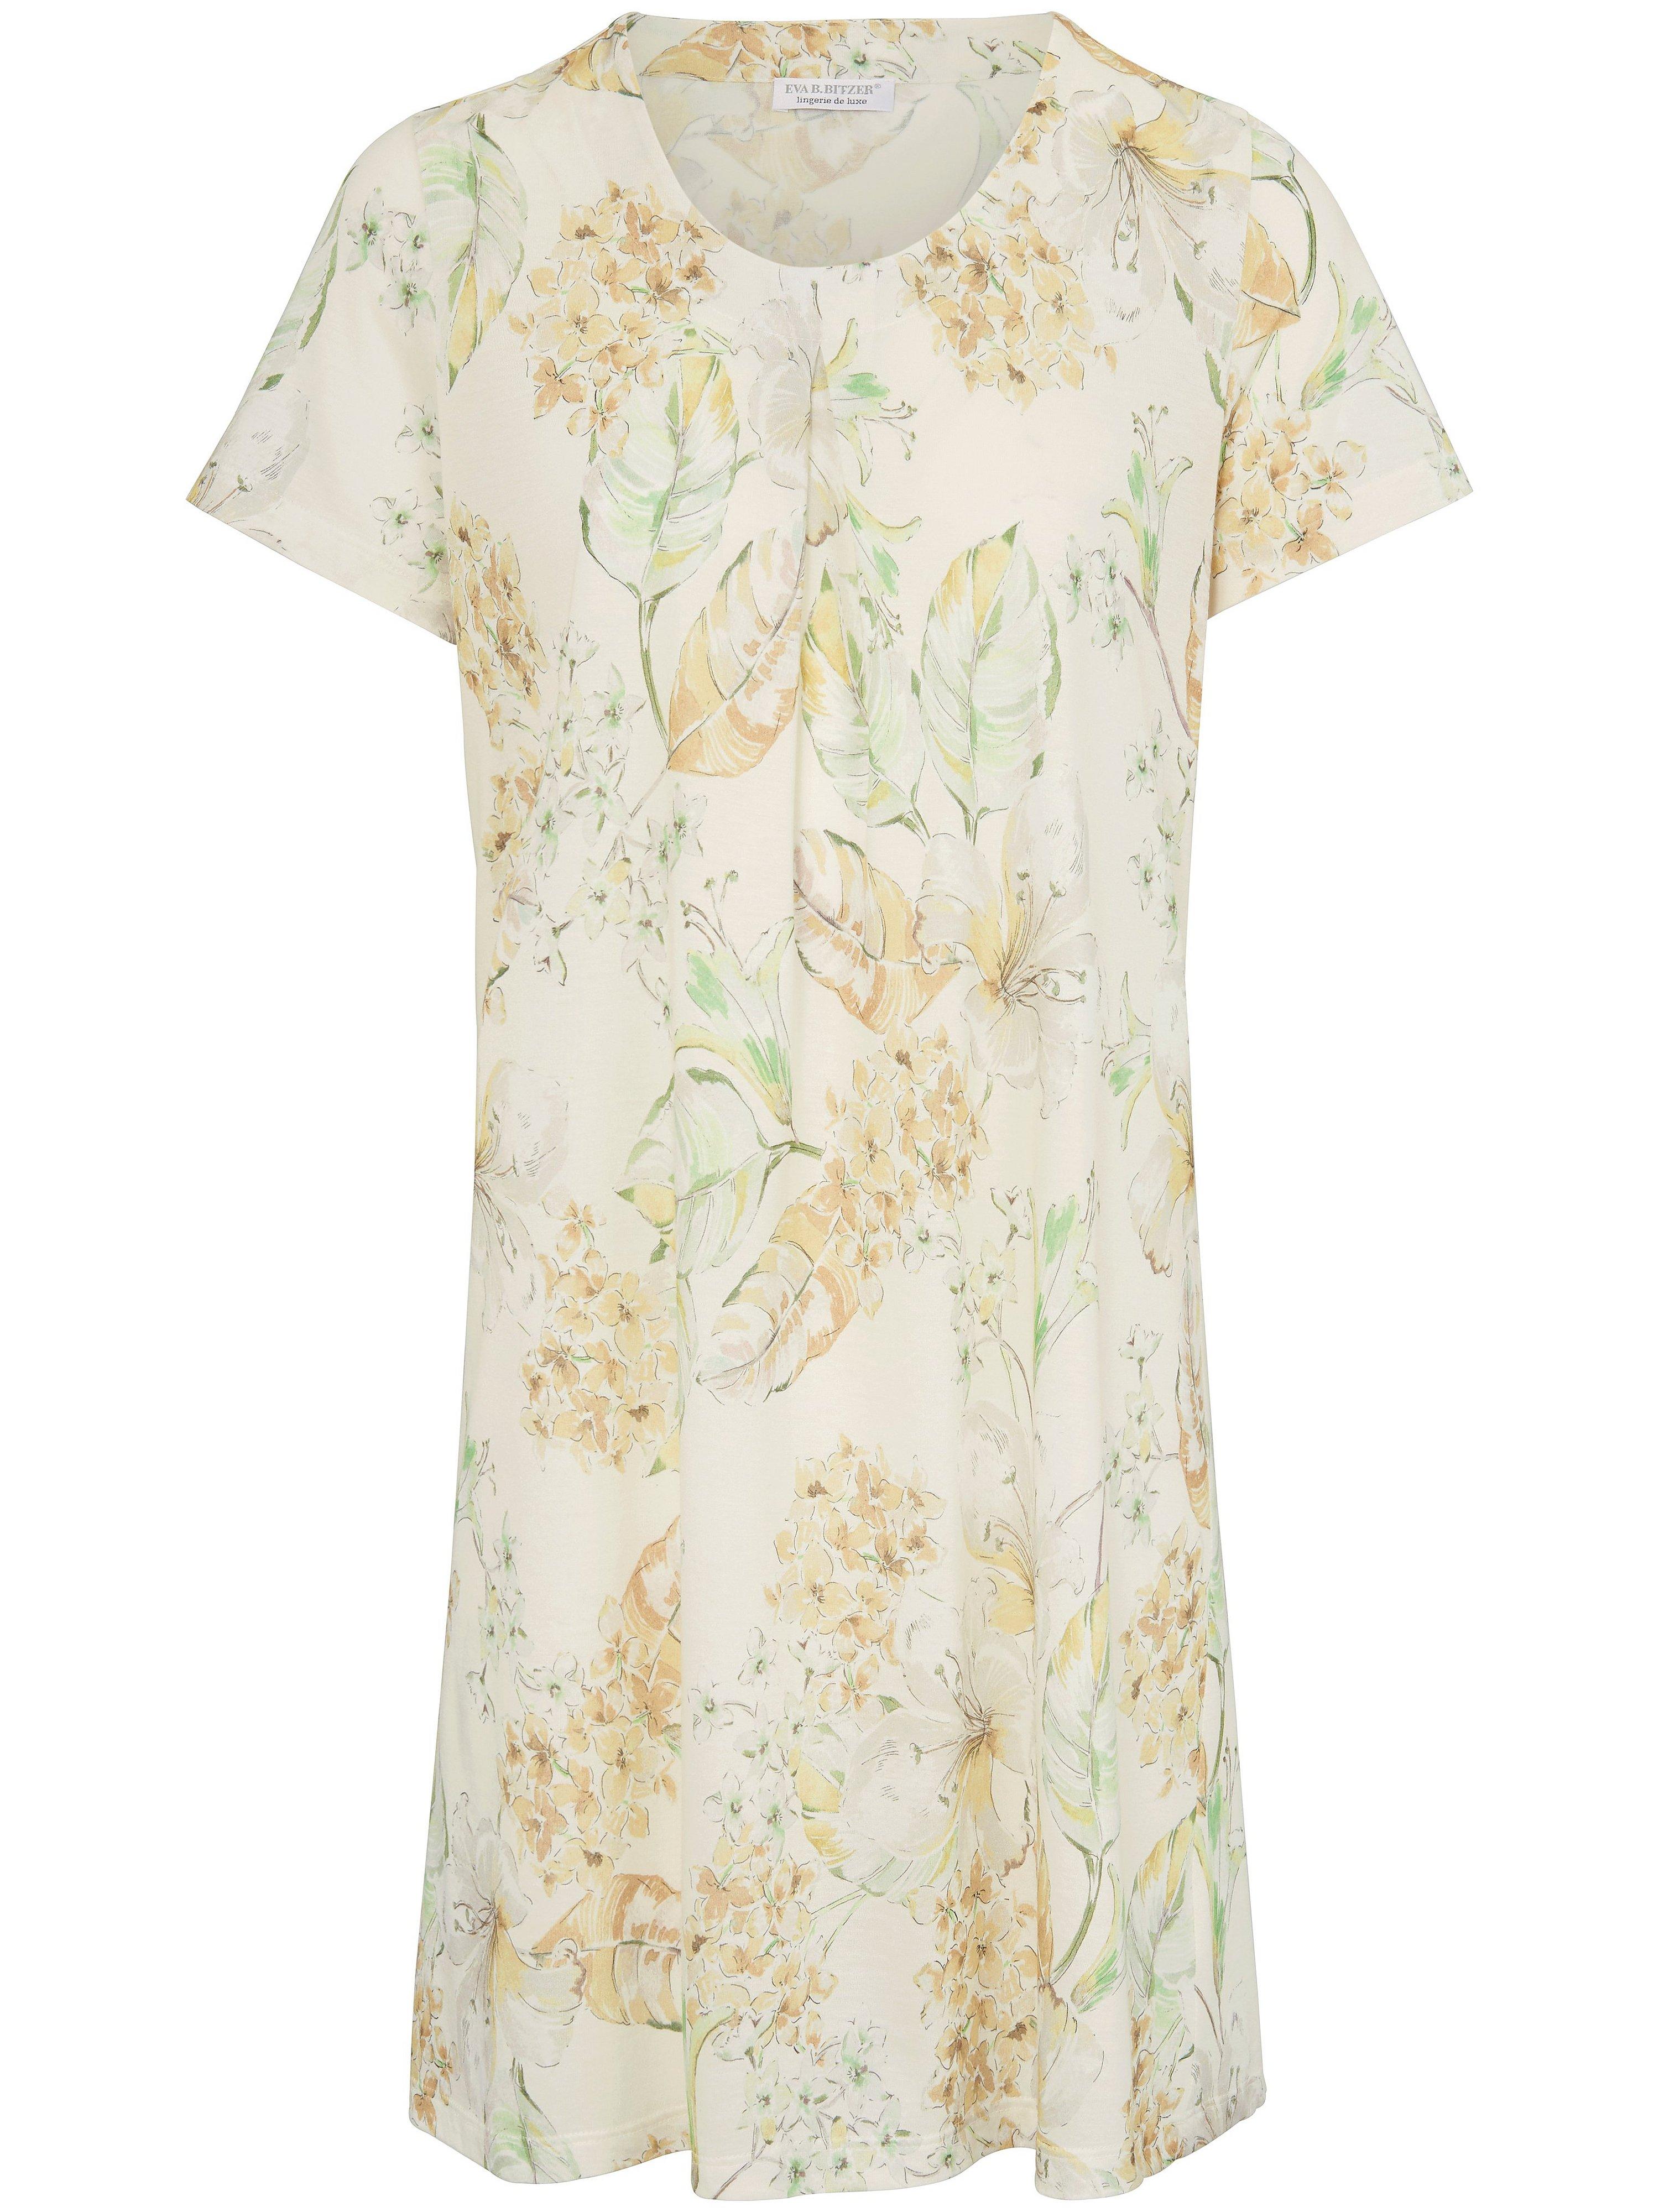 La chemise nuit manches courtes  Eva B. Bitzer jaune taille 46